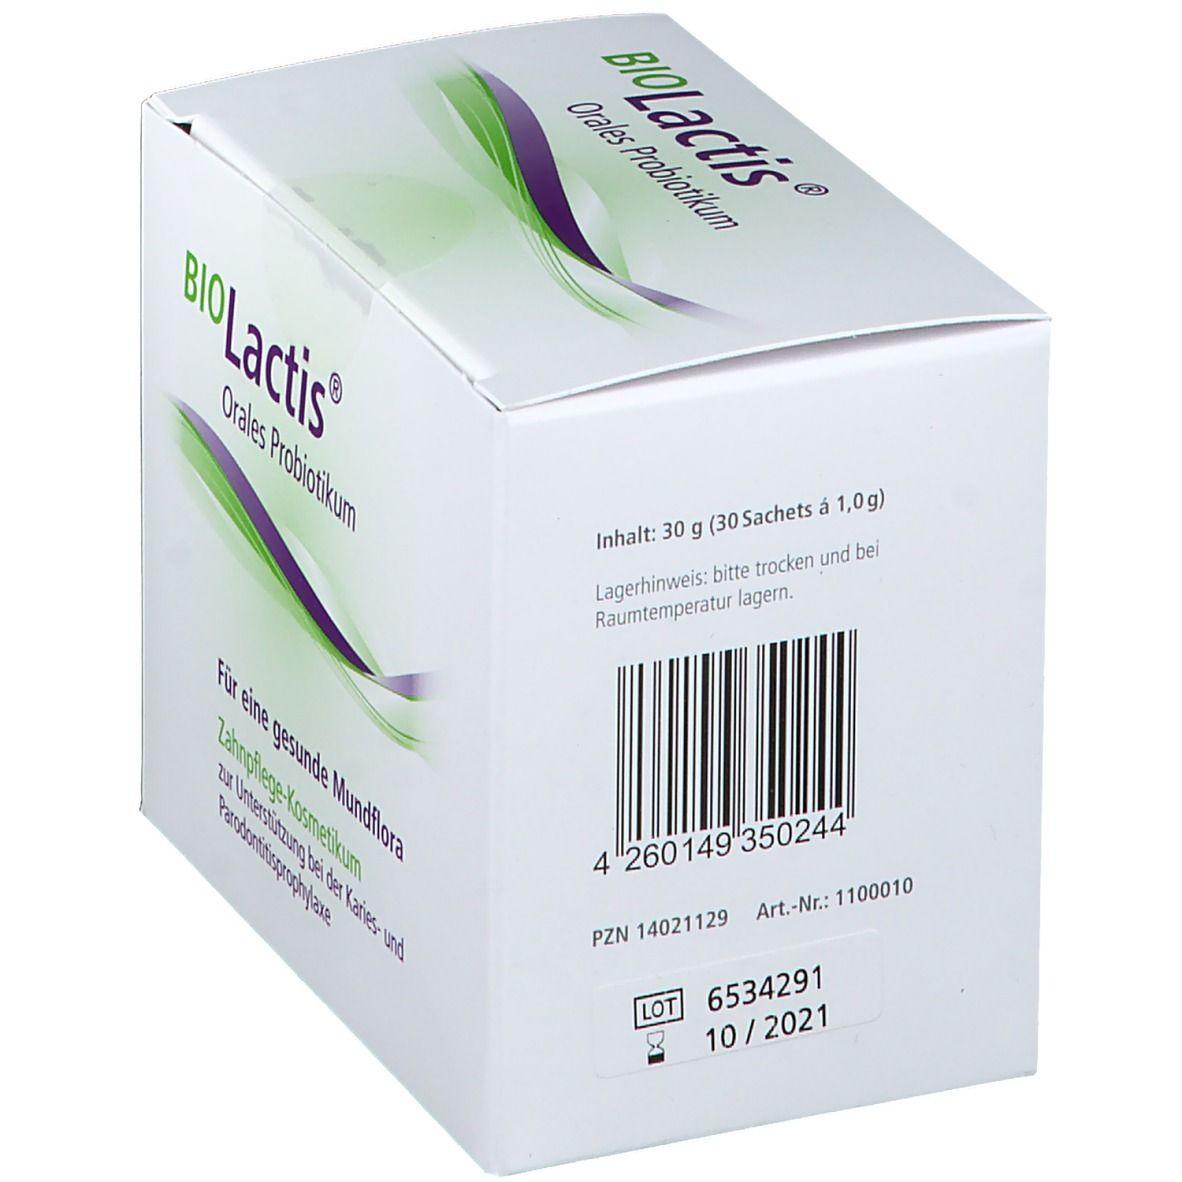 BIOLactis® Orales Probiotikum